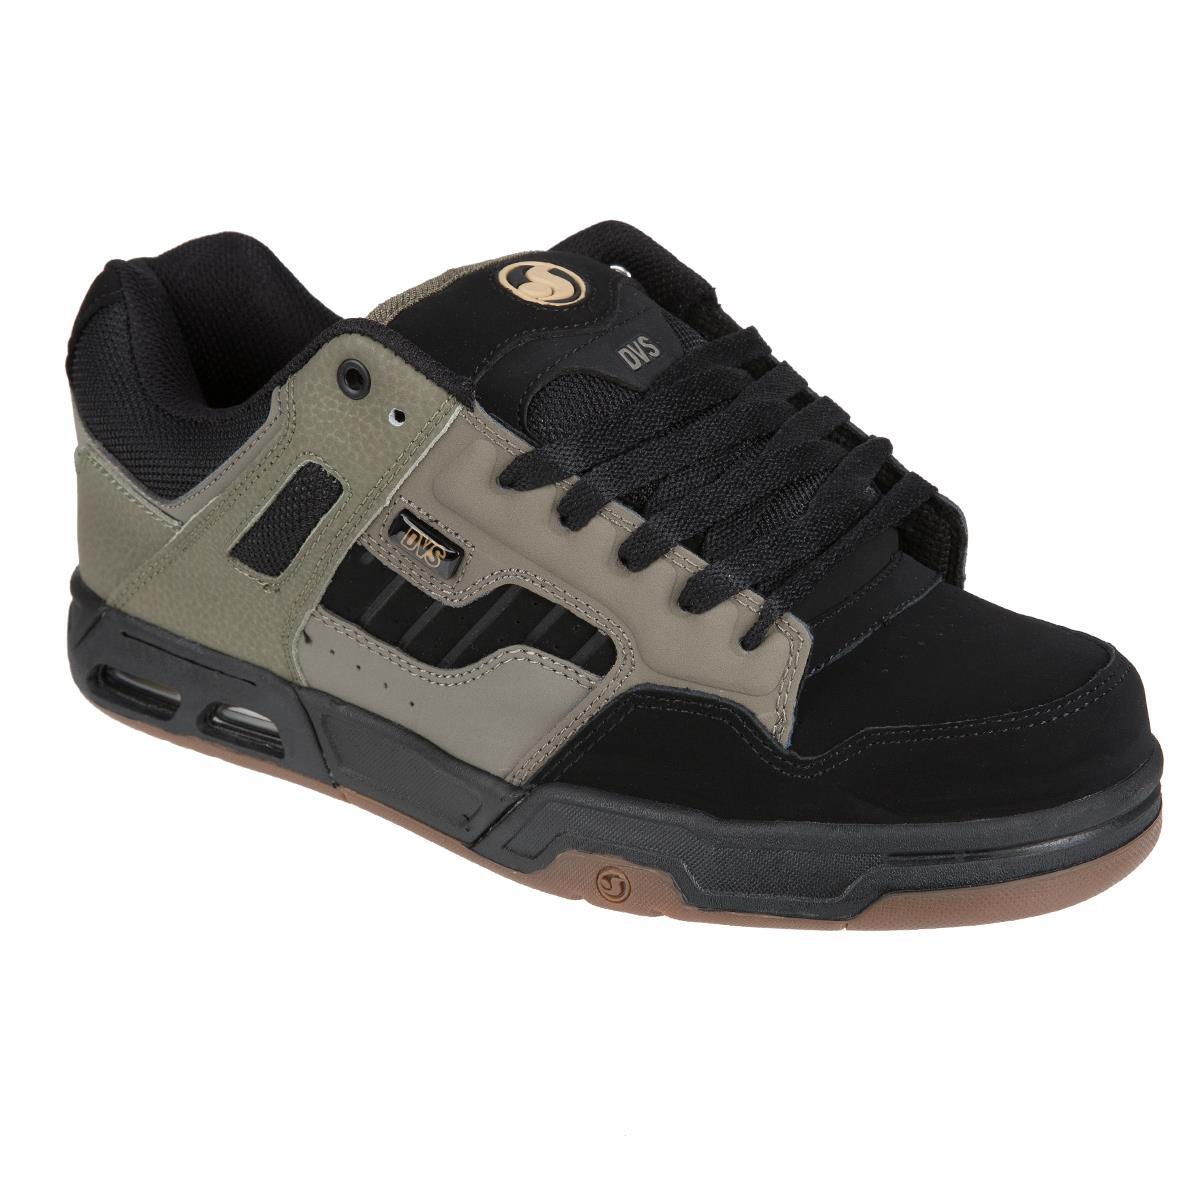 DVS Schuhe Enduro Heir Oliv/Schwarz Gum Nubuk